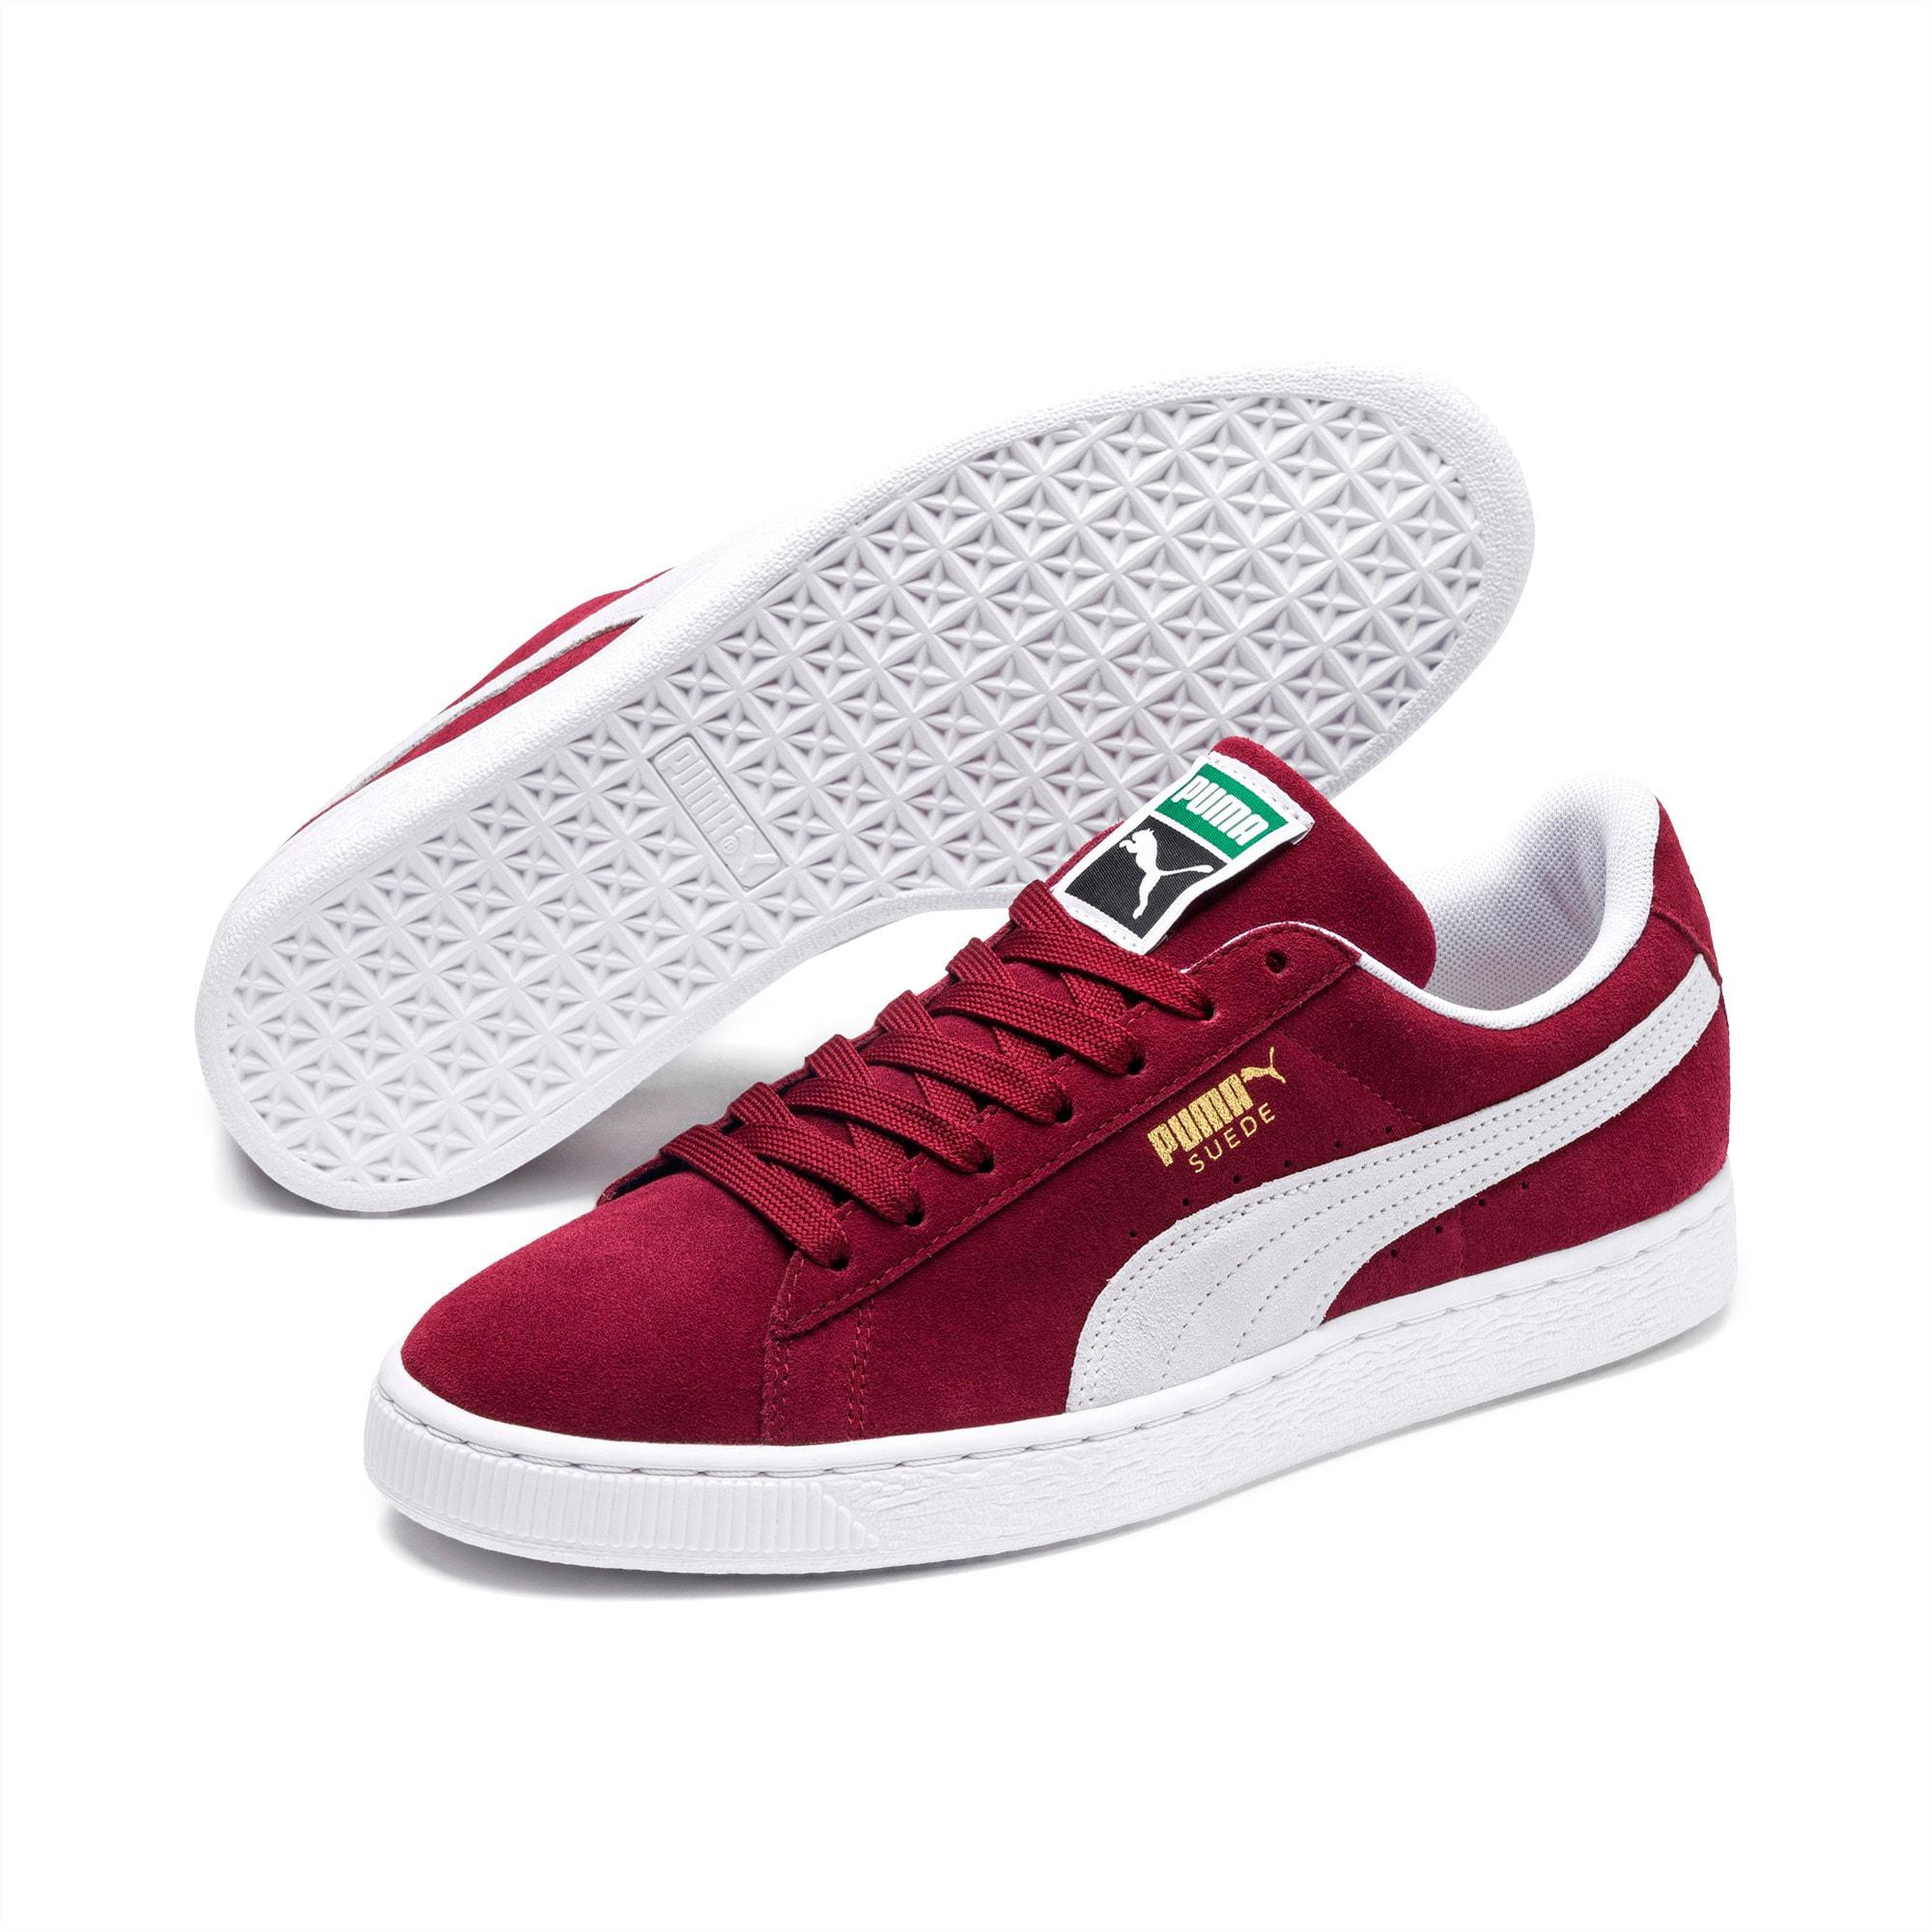 puma suede shoes price